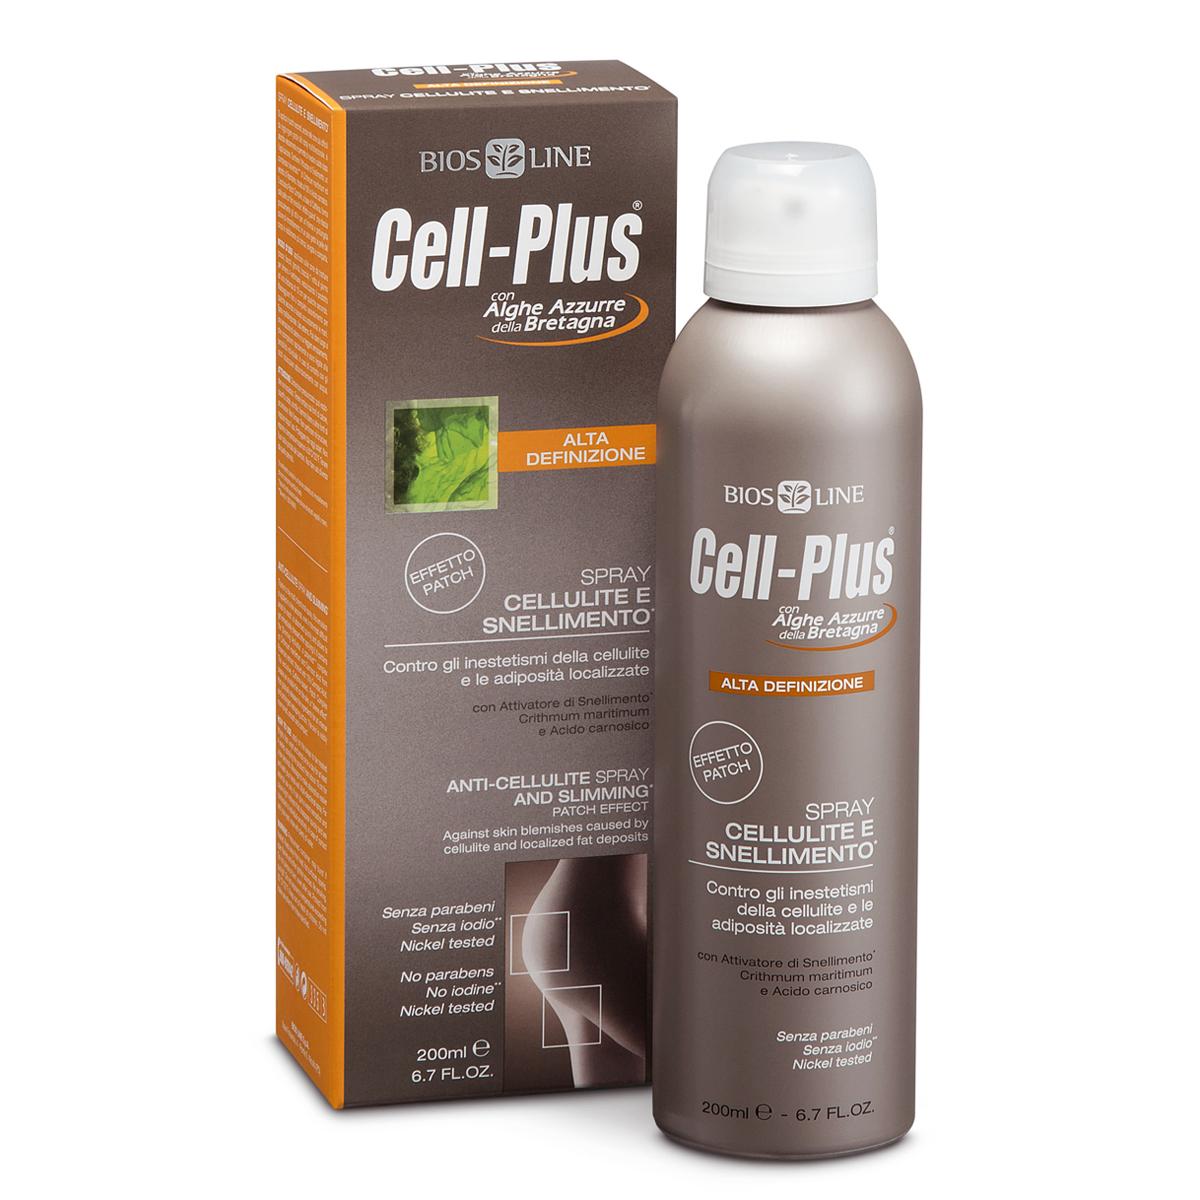 Spray Cellulite Snellimento Cell-Plus